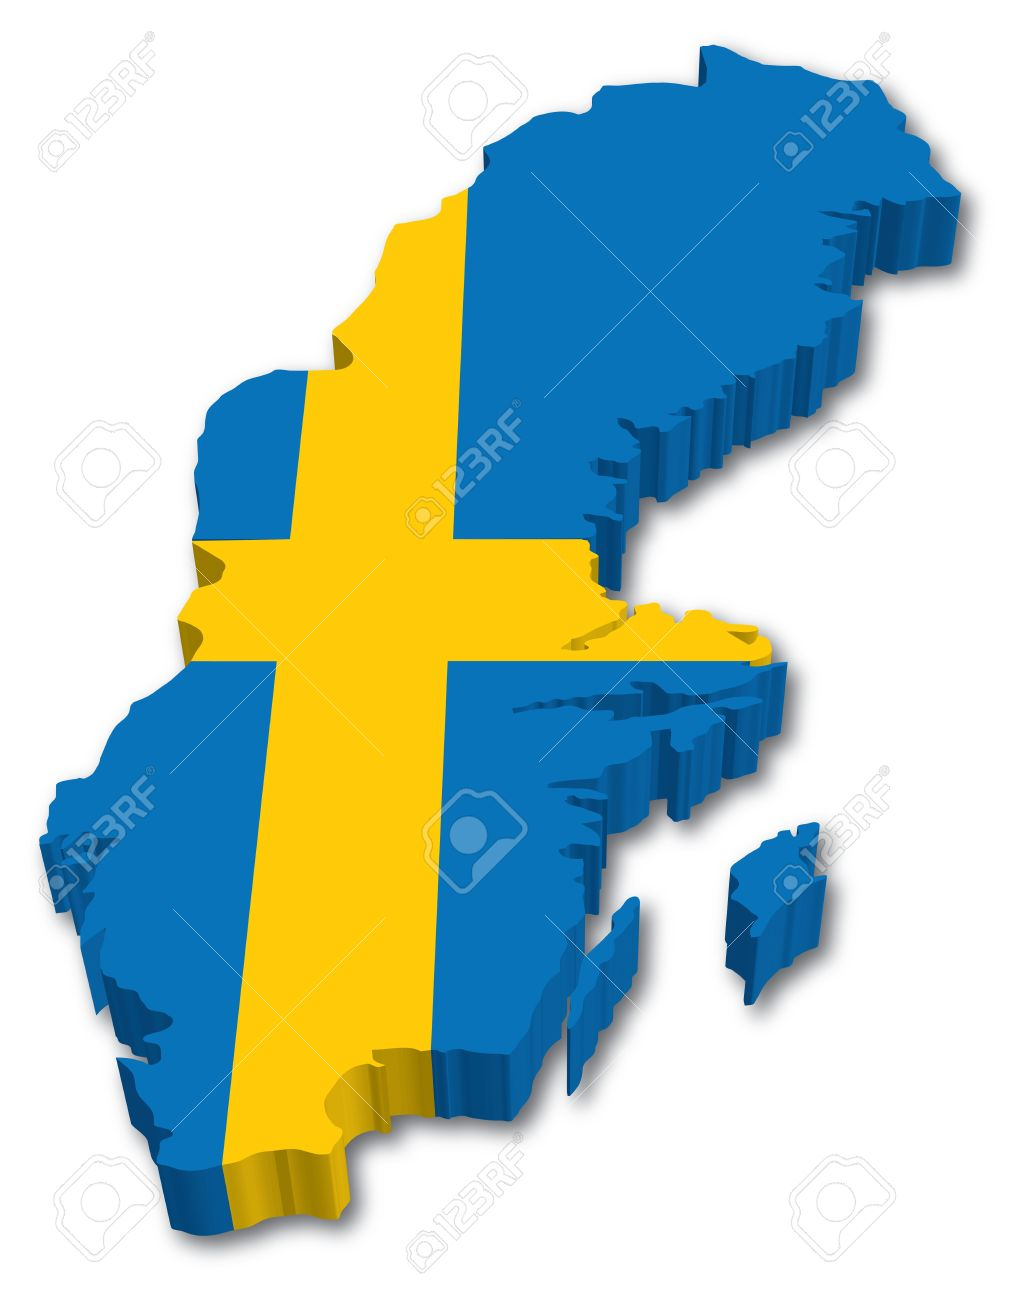 D Sweden Map With Flag Illustration On White Background Royalty - Sweden map 3d